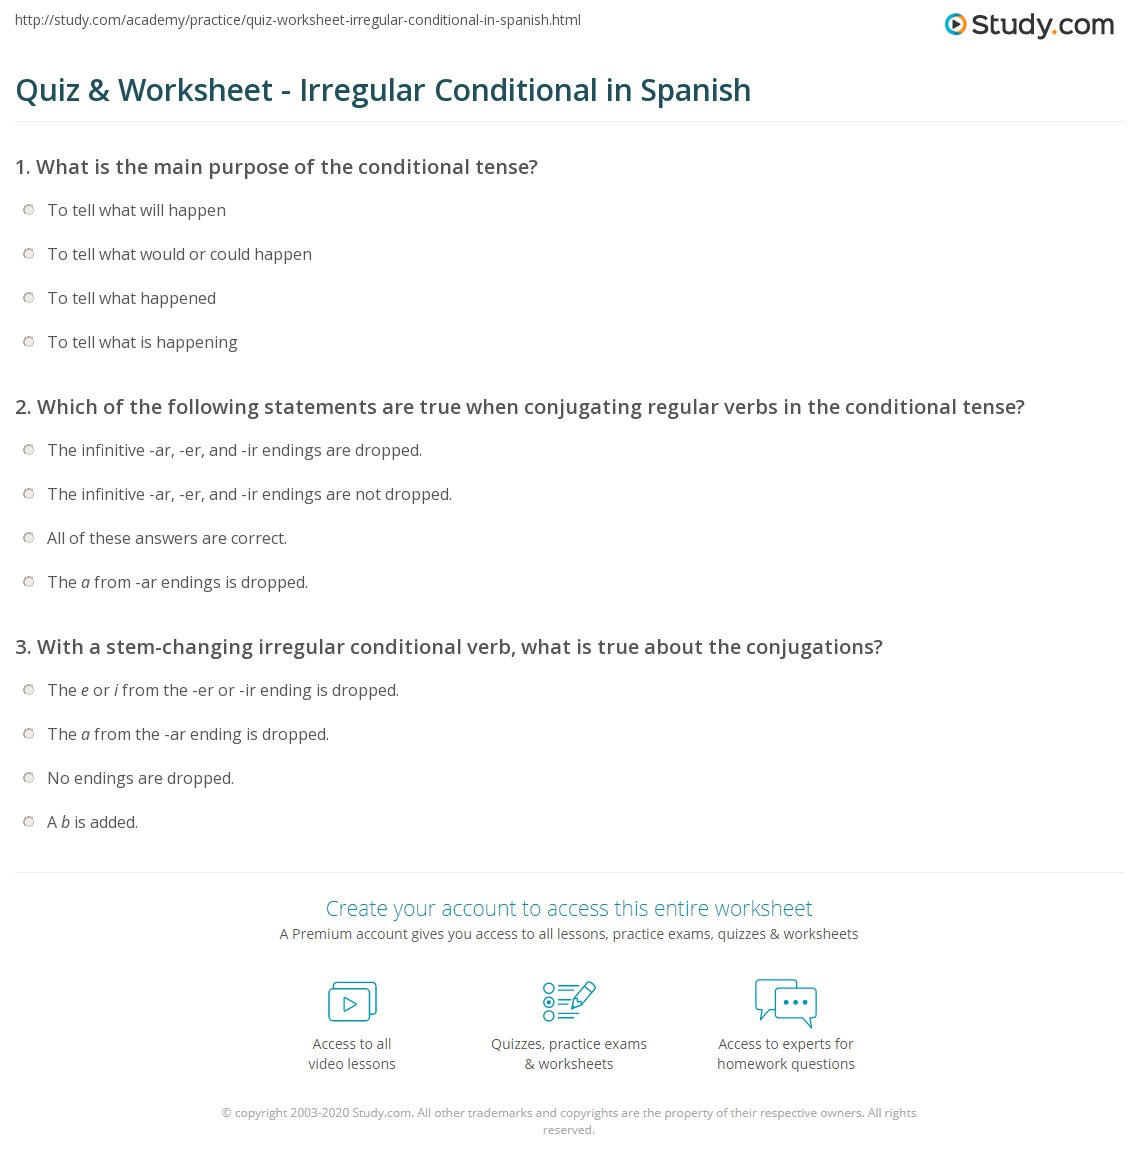 Quiz Worksheet Irregular Conditional In Spanish